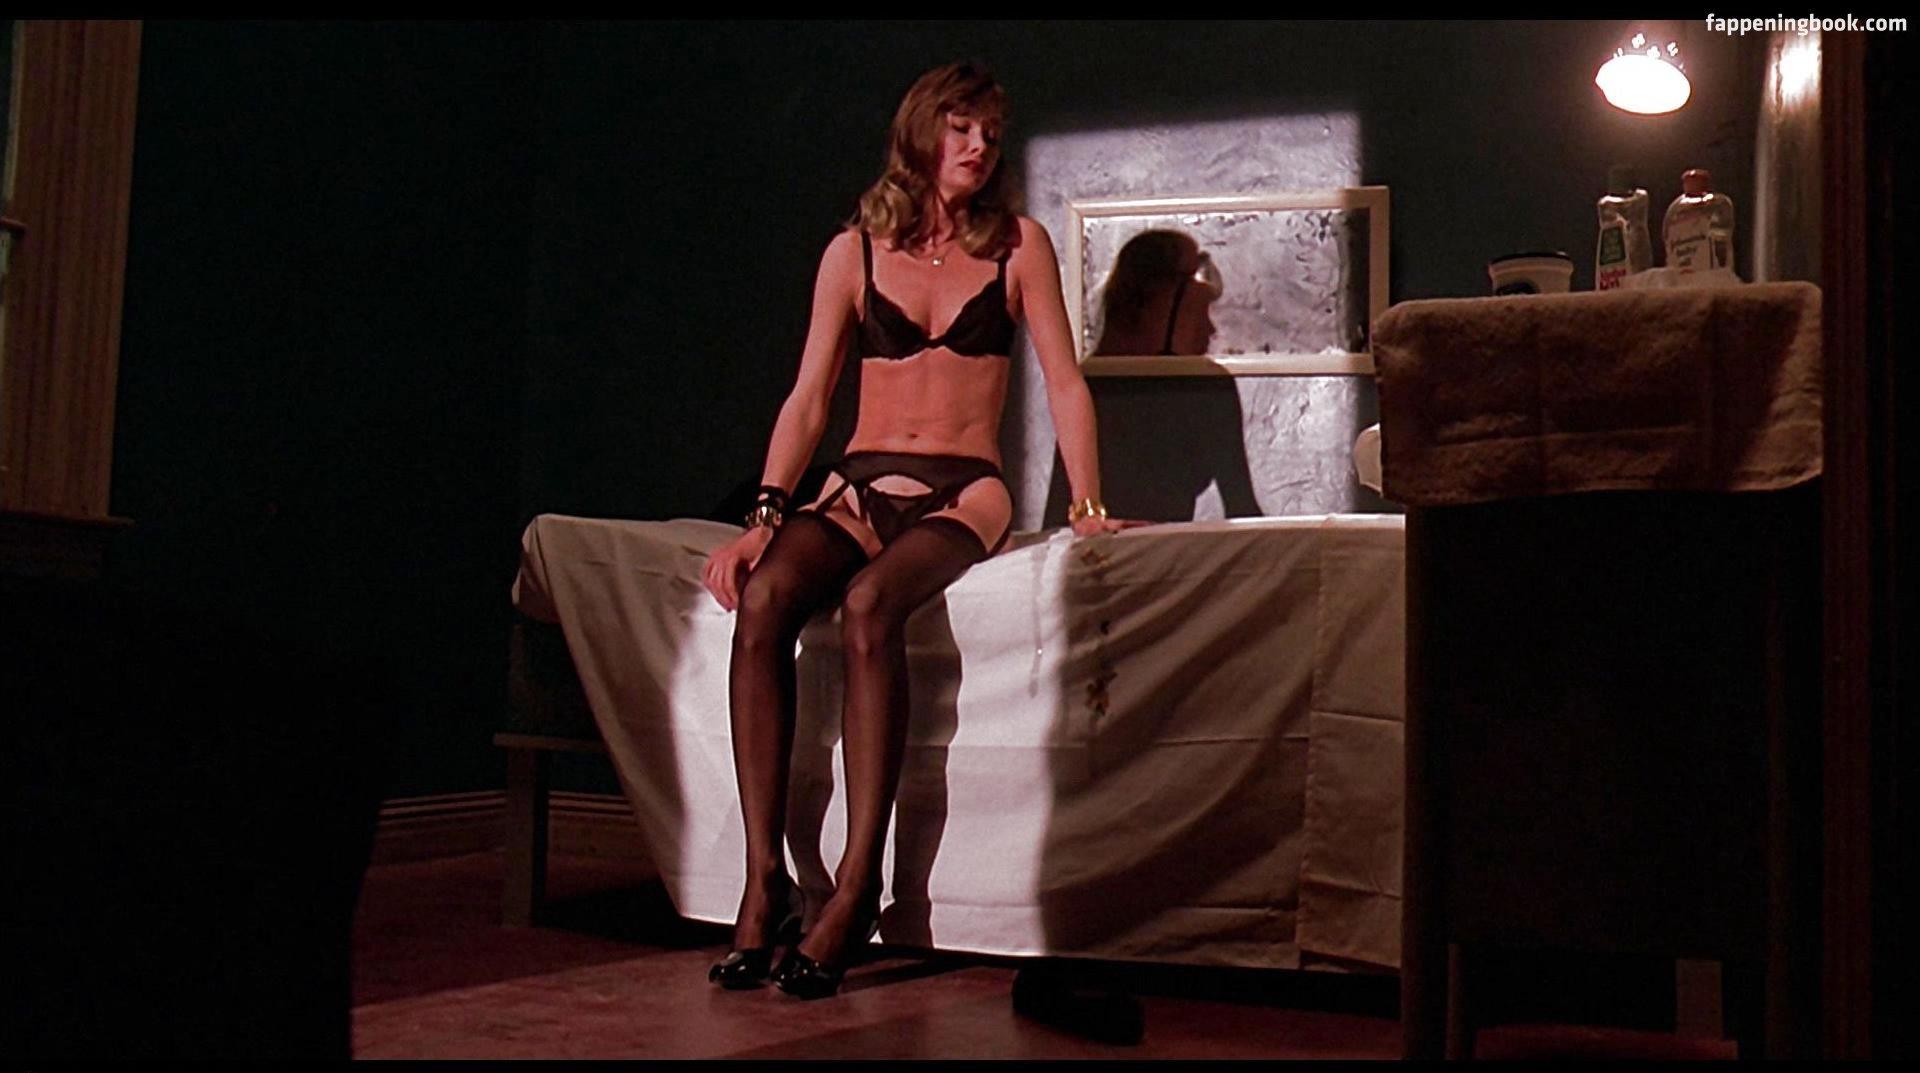 Sexy Jennifer Lowery Nude Photos Gif